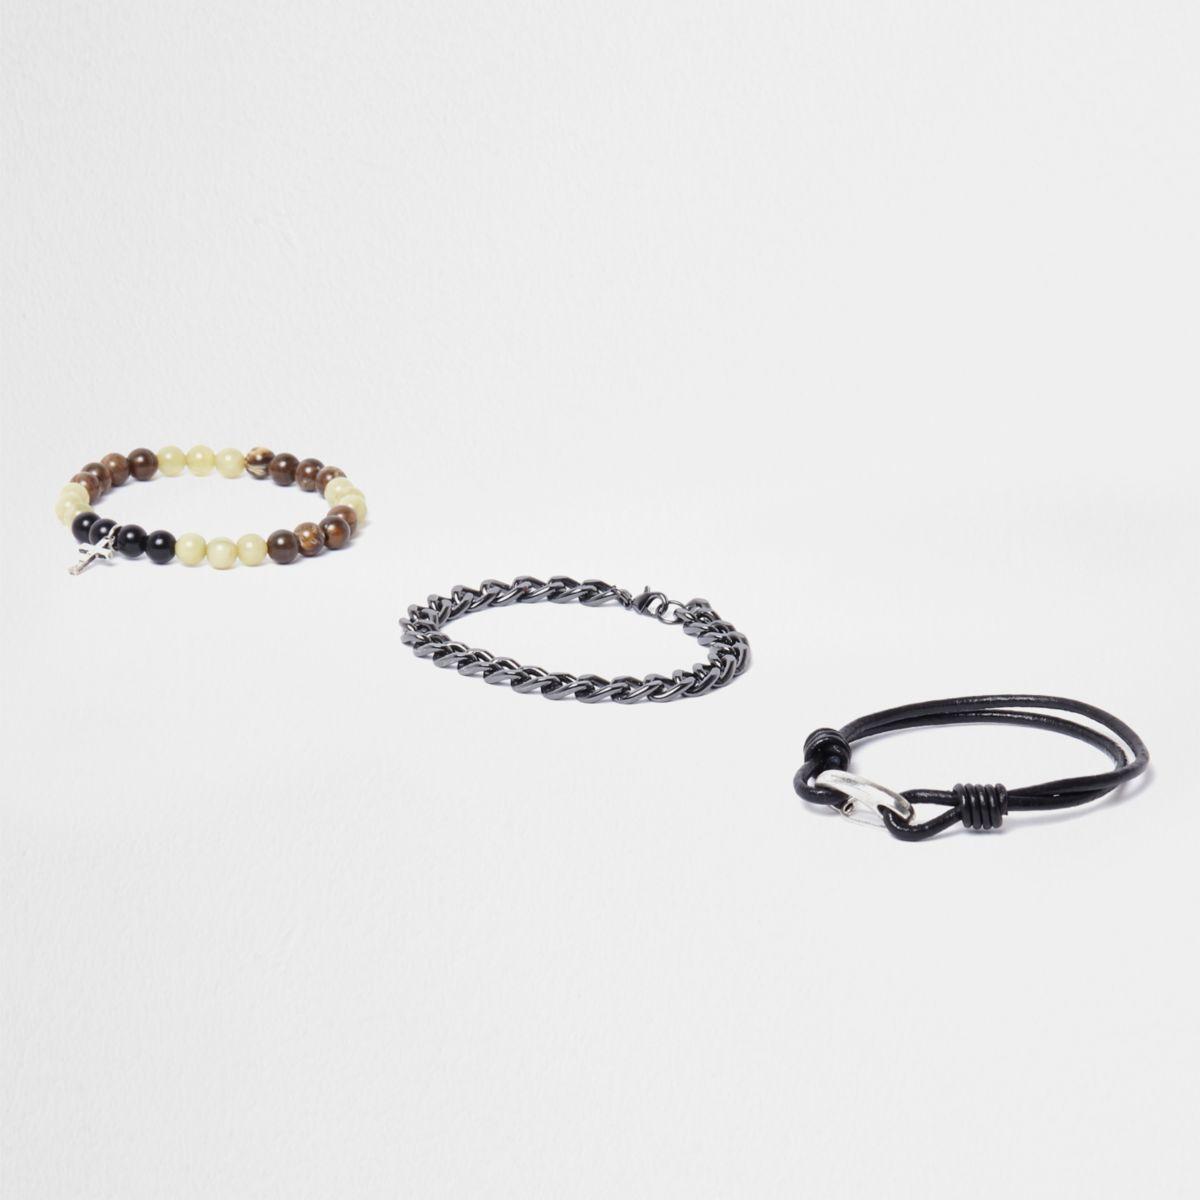 Black chain and beaded bracelet pack